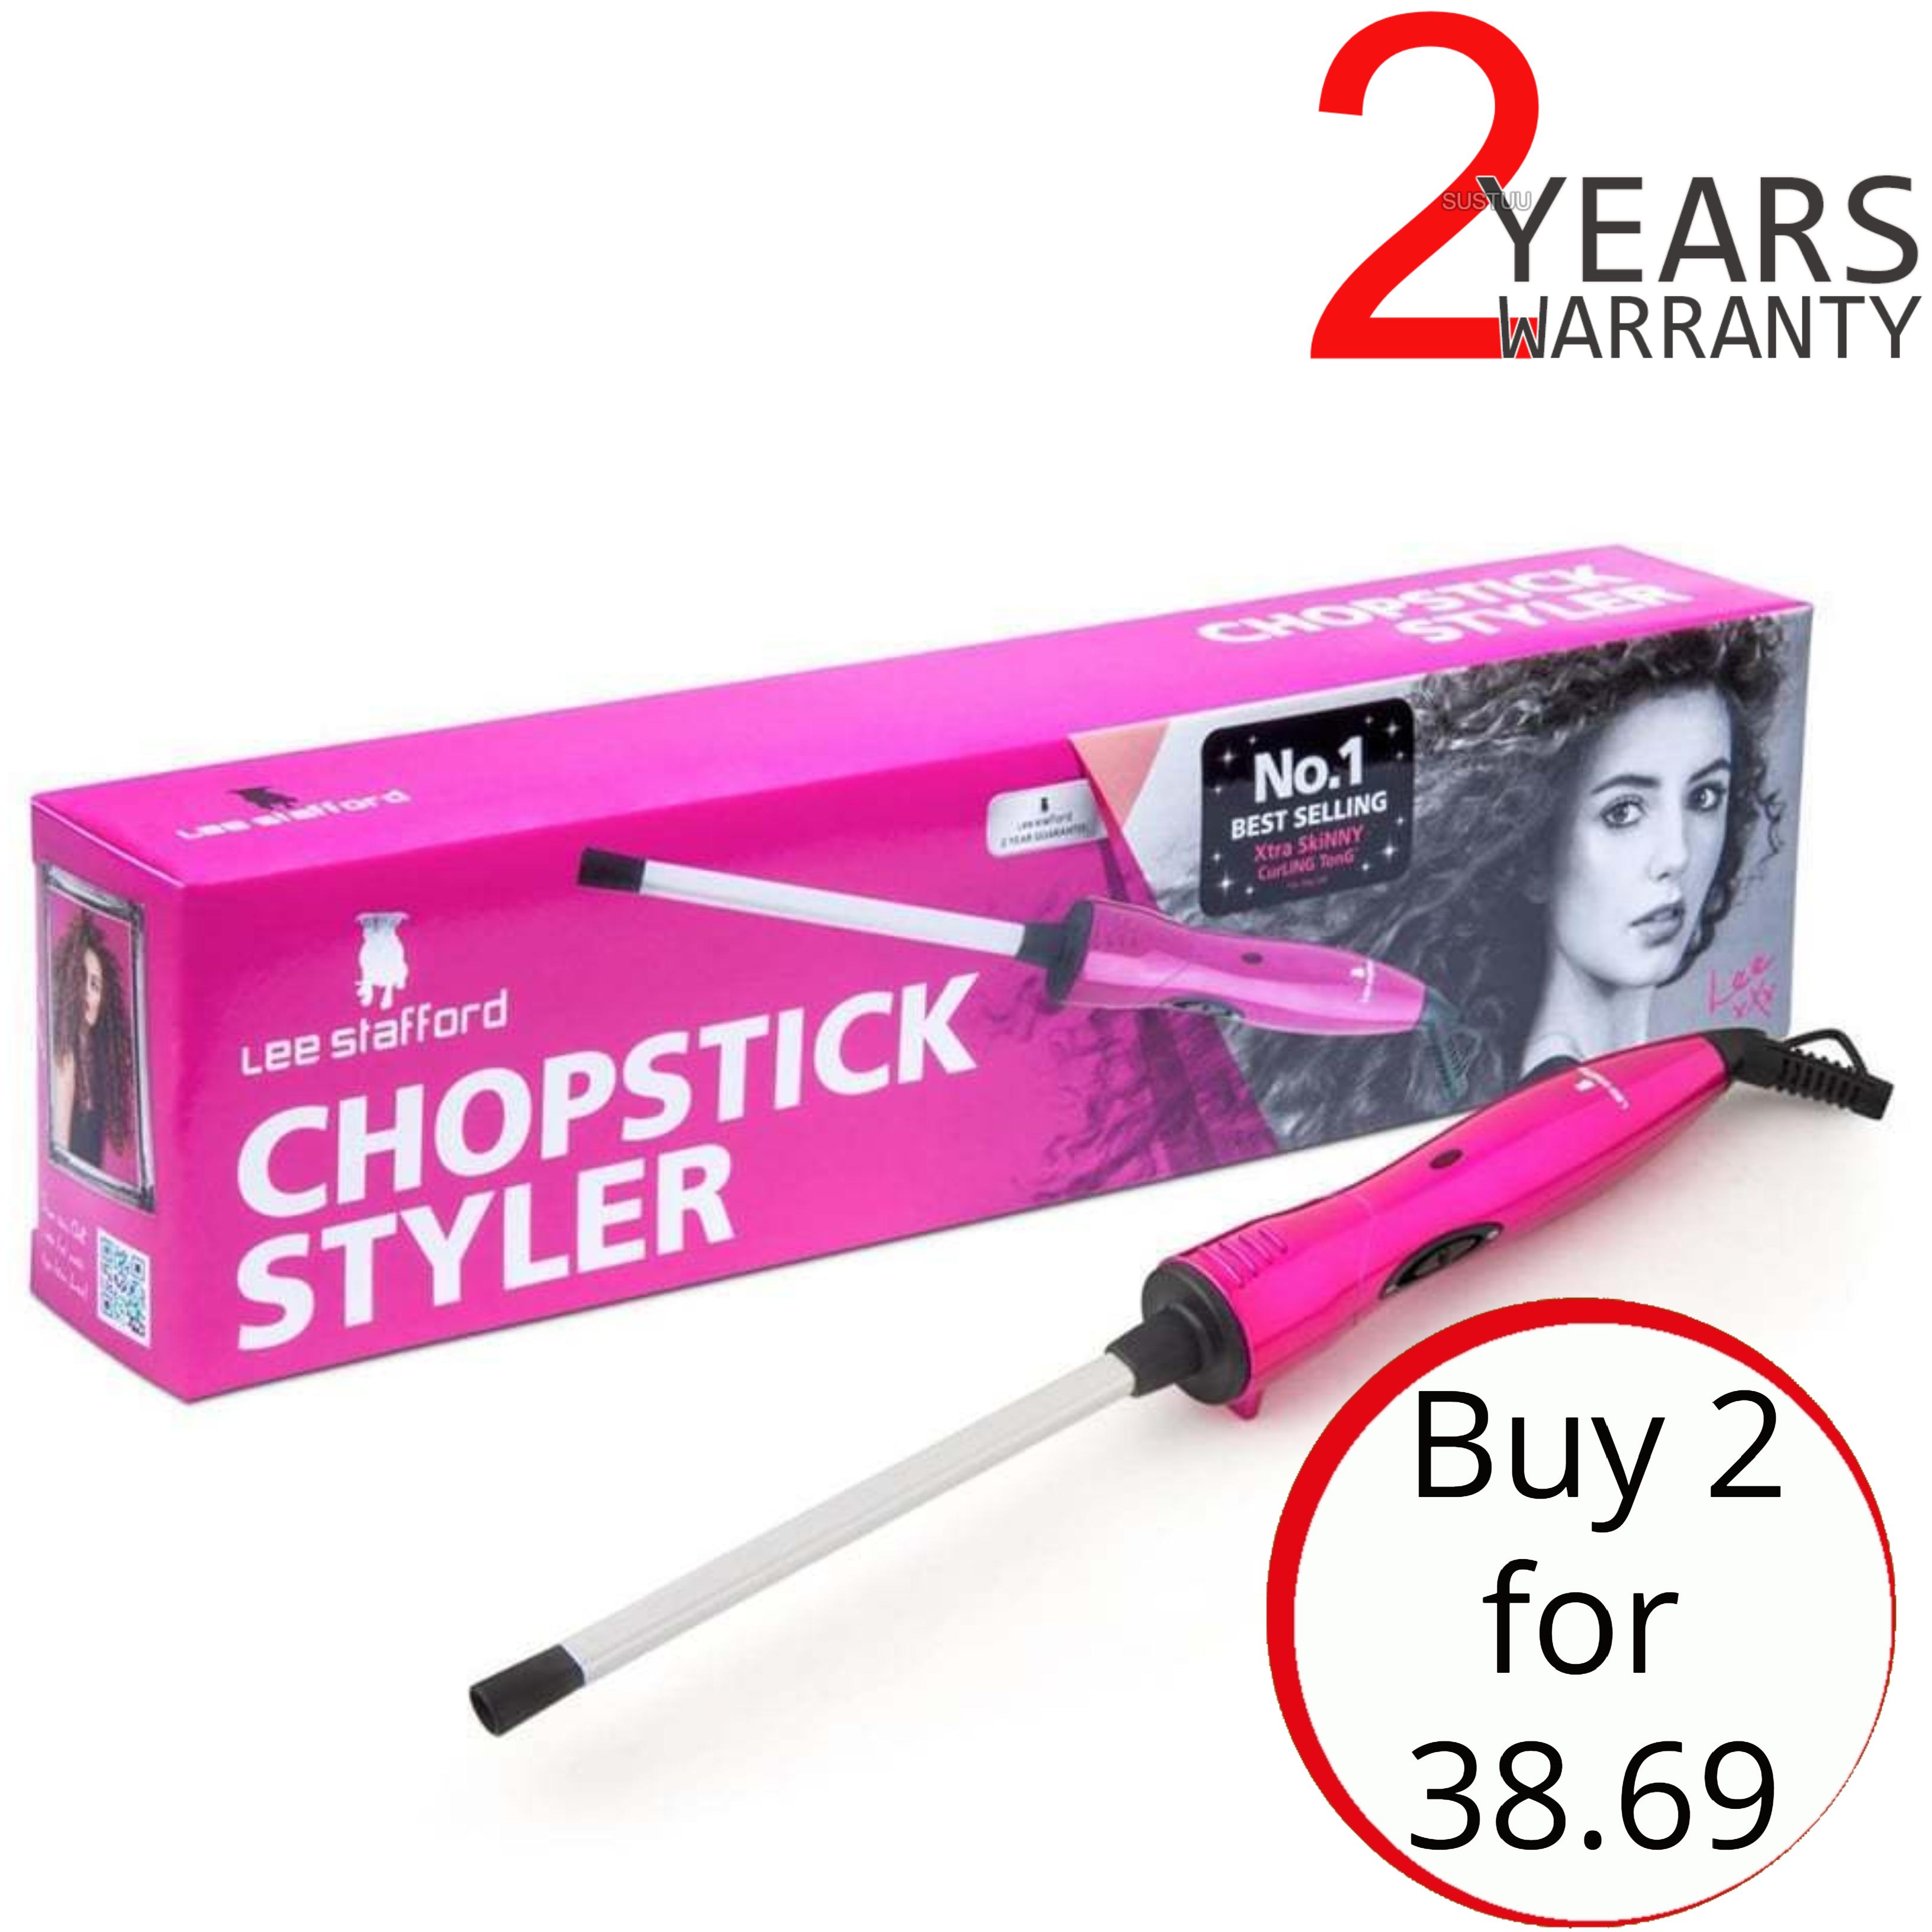 2 x Lee Stafford The Original Chopstick Styler | Ceramic Hair Curler Wand | 200°C | LSHT01